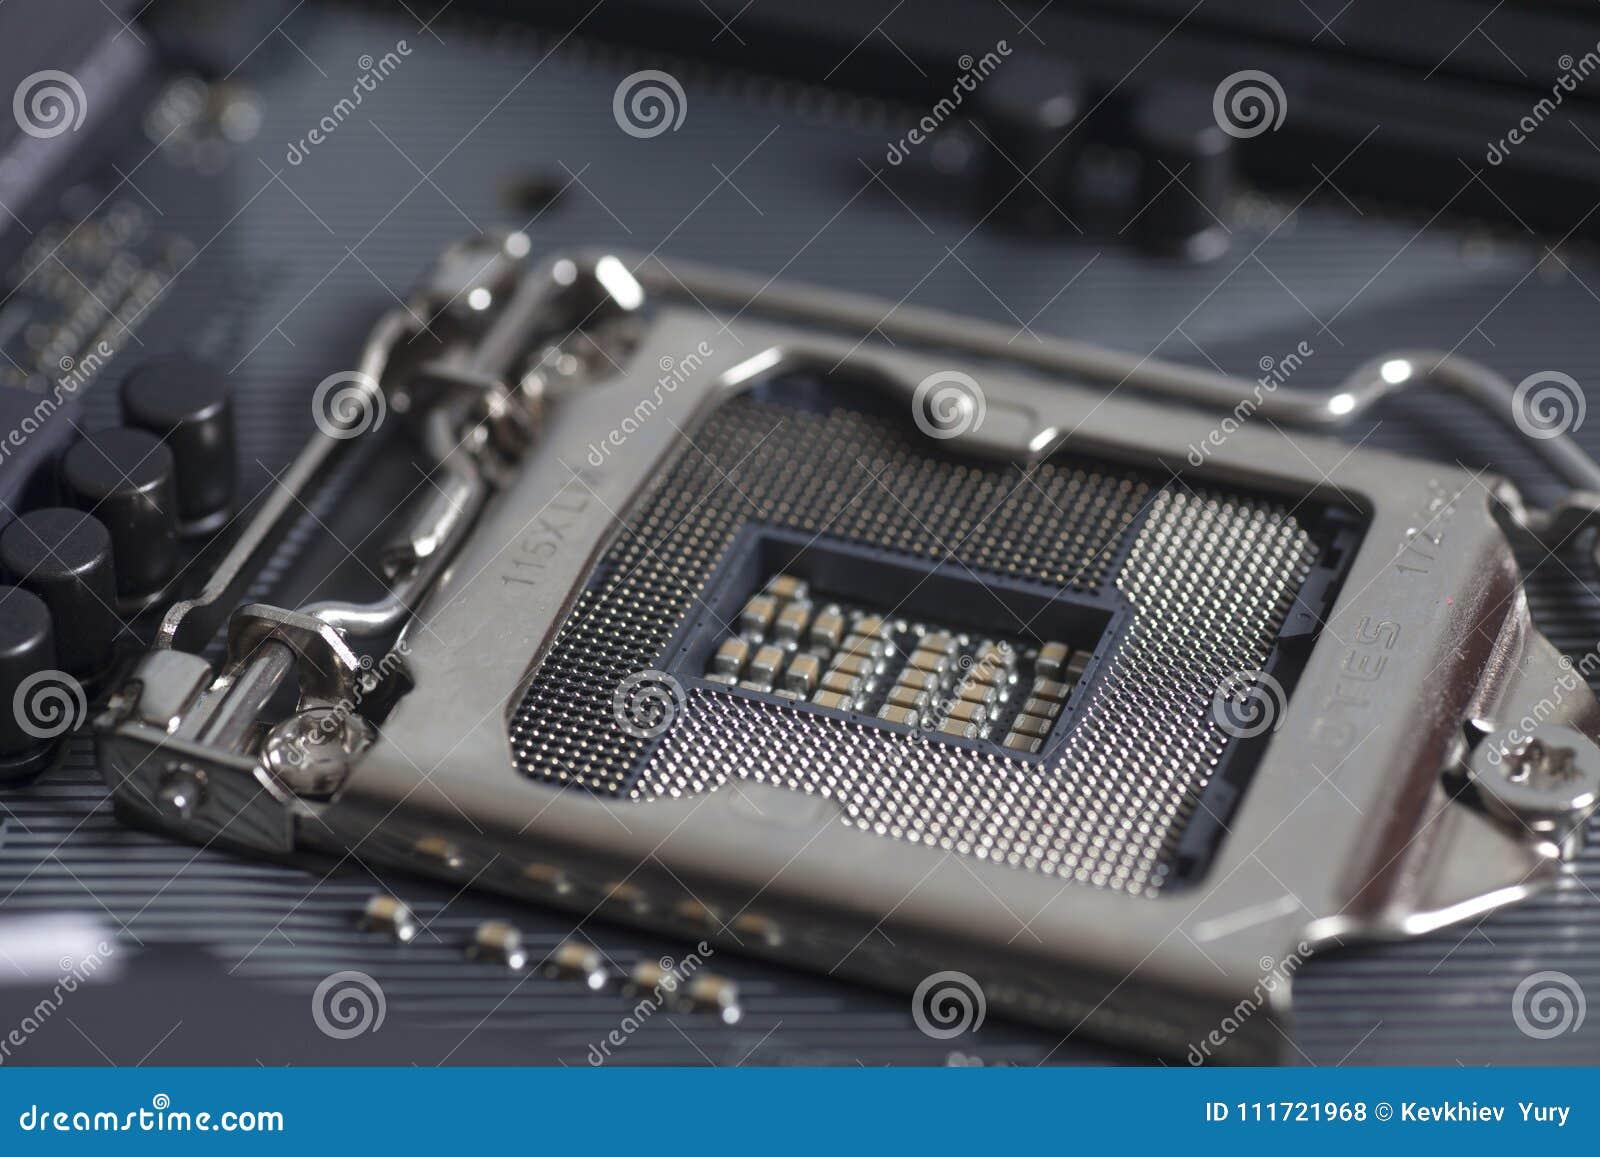 Intel LGA 1151 cpu socket on motherboard Computer PC